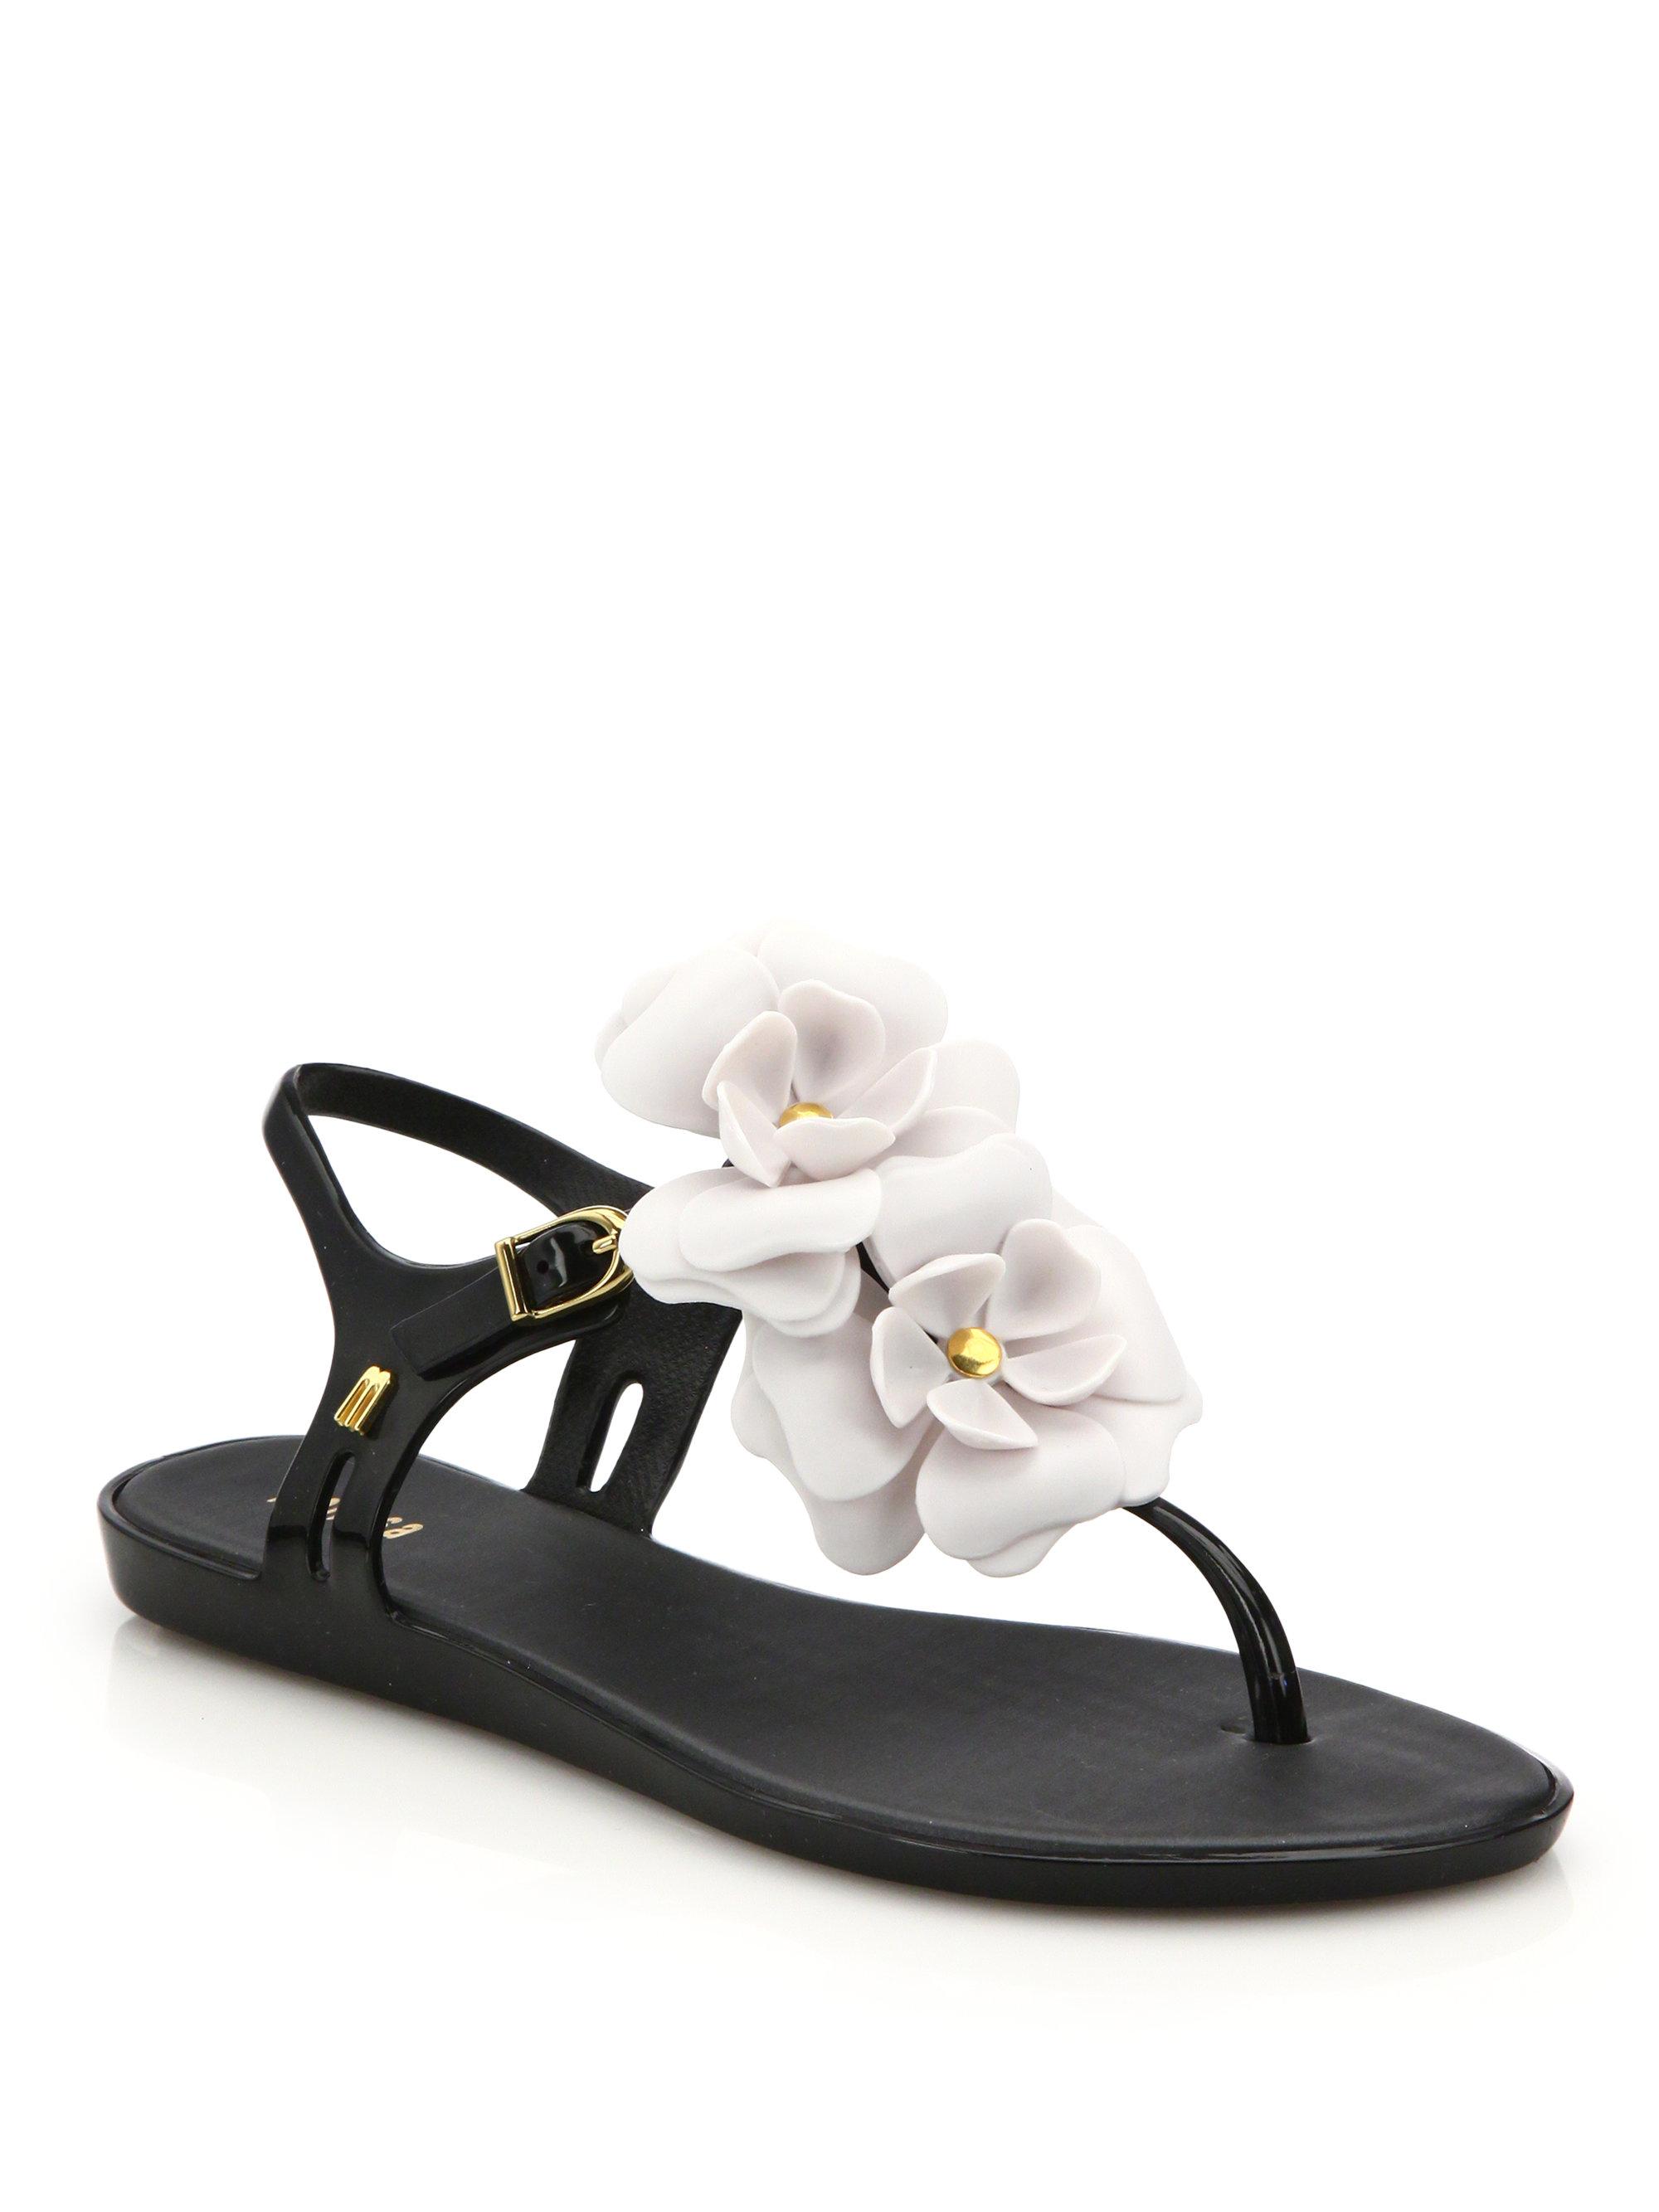 175039b0b6e4d7 Lyst - Melissa Solar Garden Ii Rose Sandals in Black